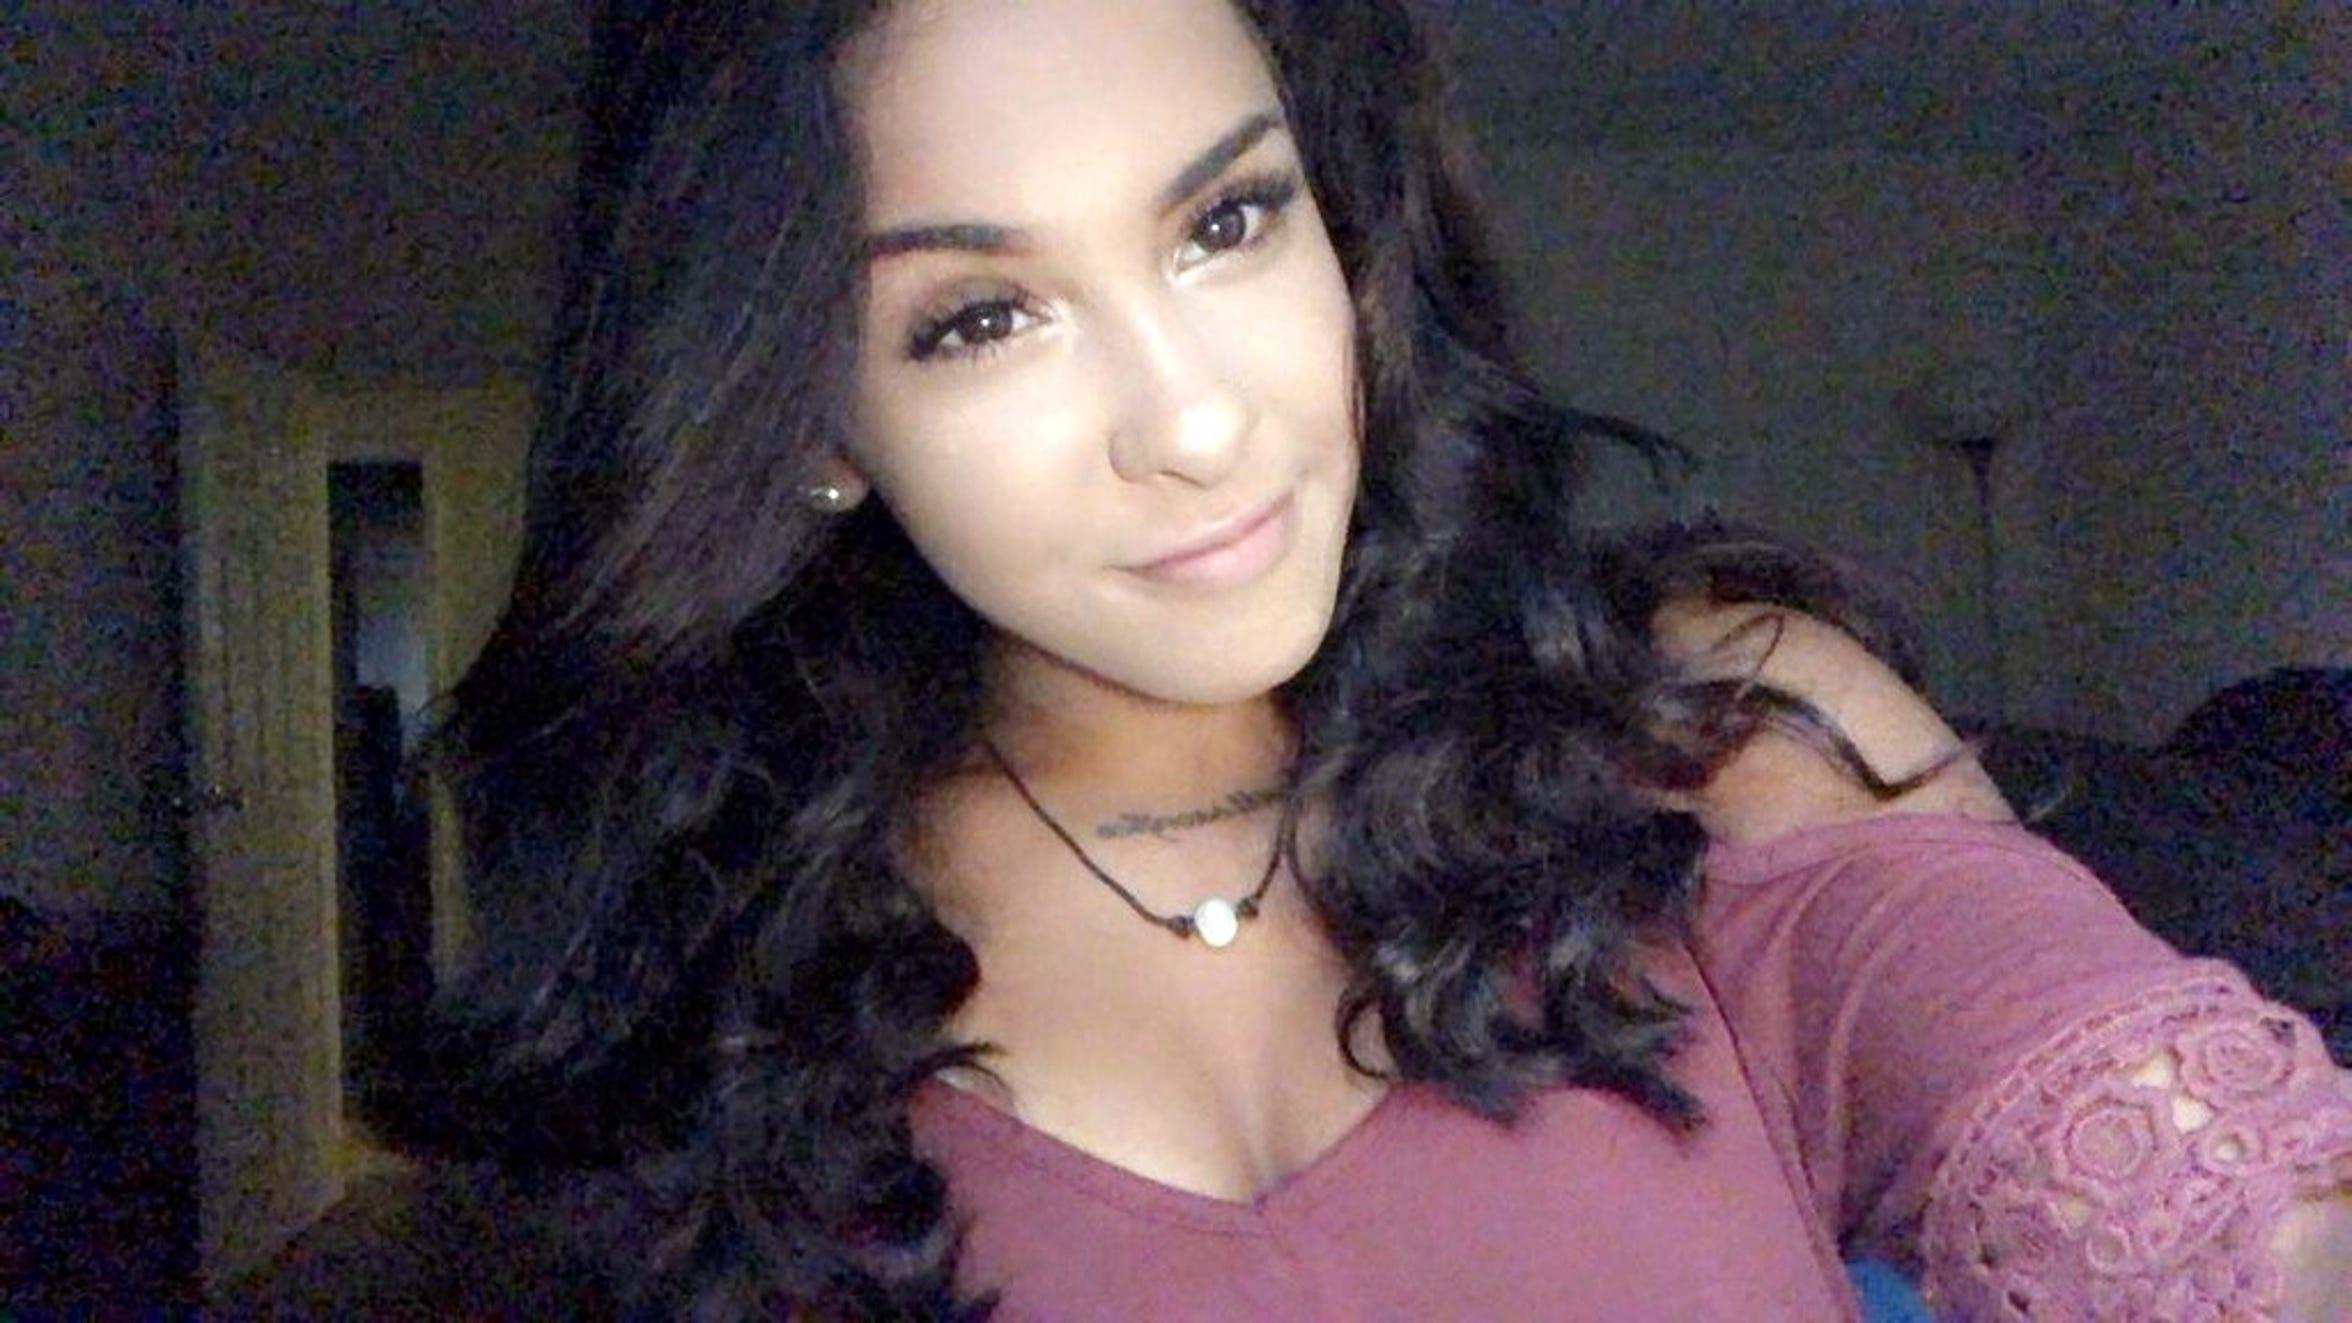 Sarah Hope Aziz was killed July 6.